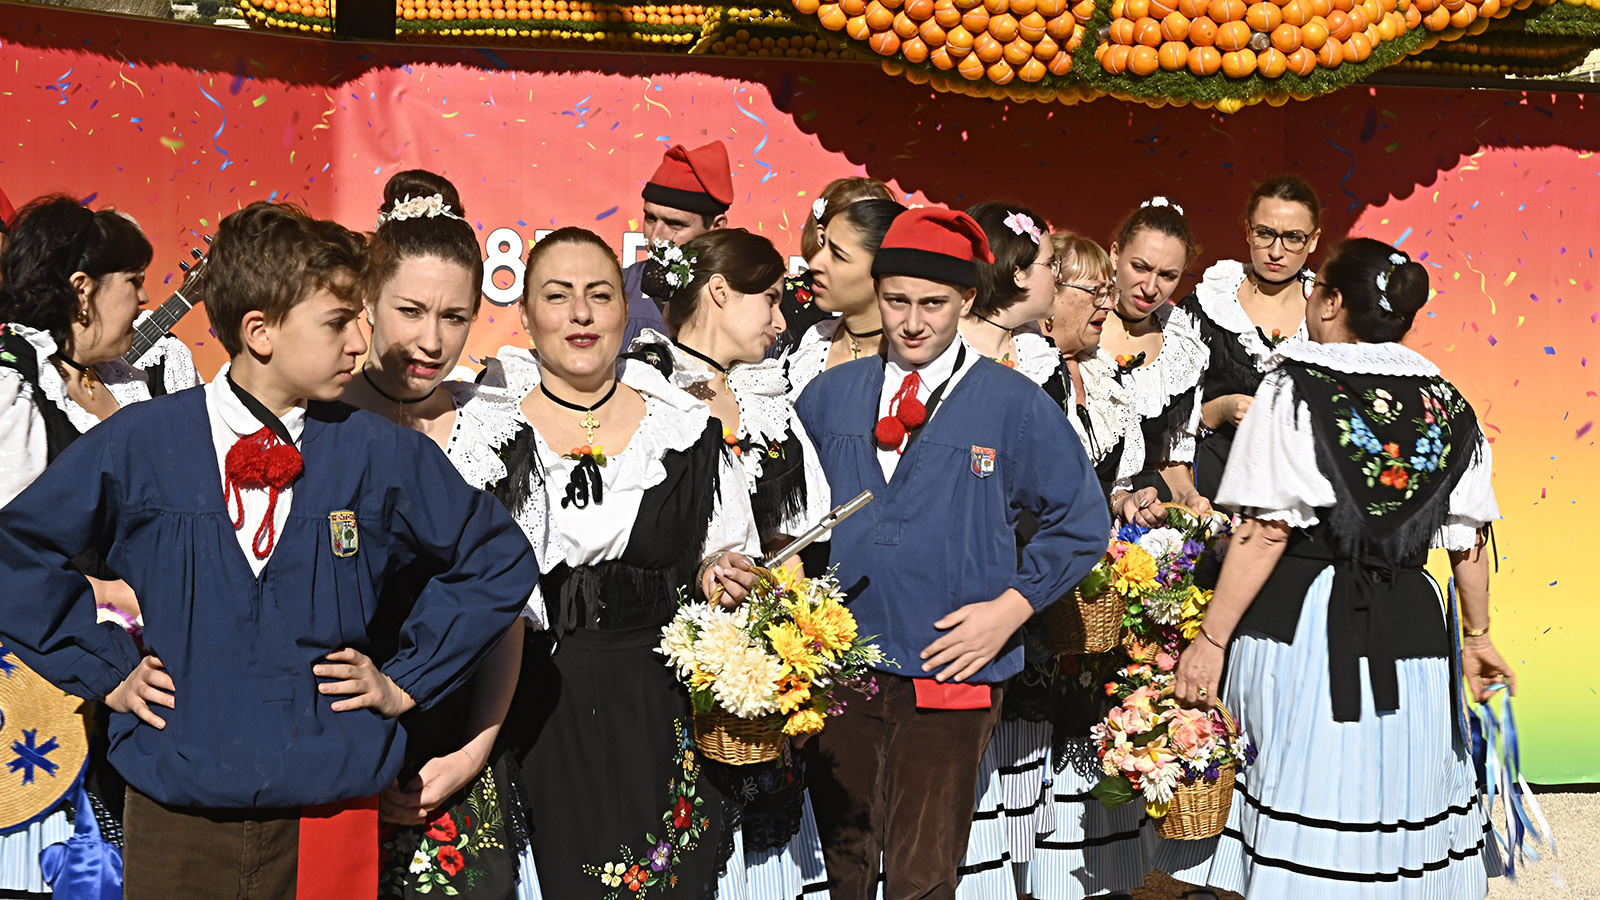 Fête du Citron: Trachtengruppe bei der Eröffnung. Foto: Hilke Maunder